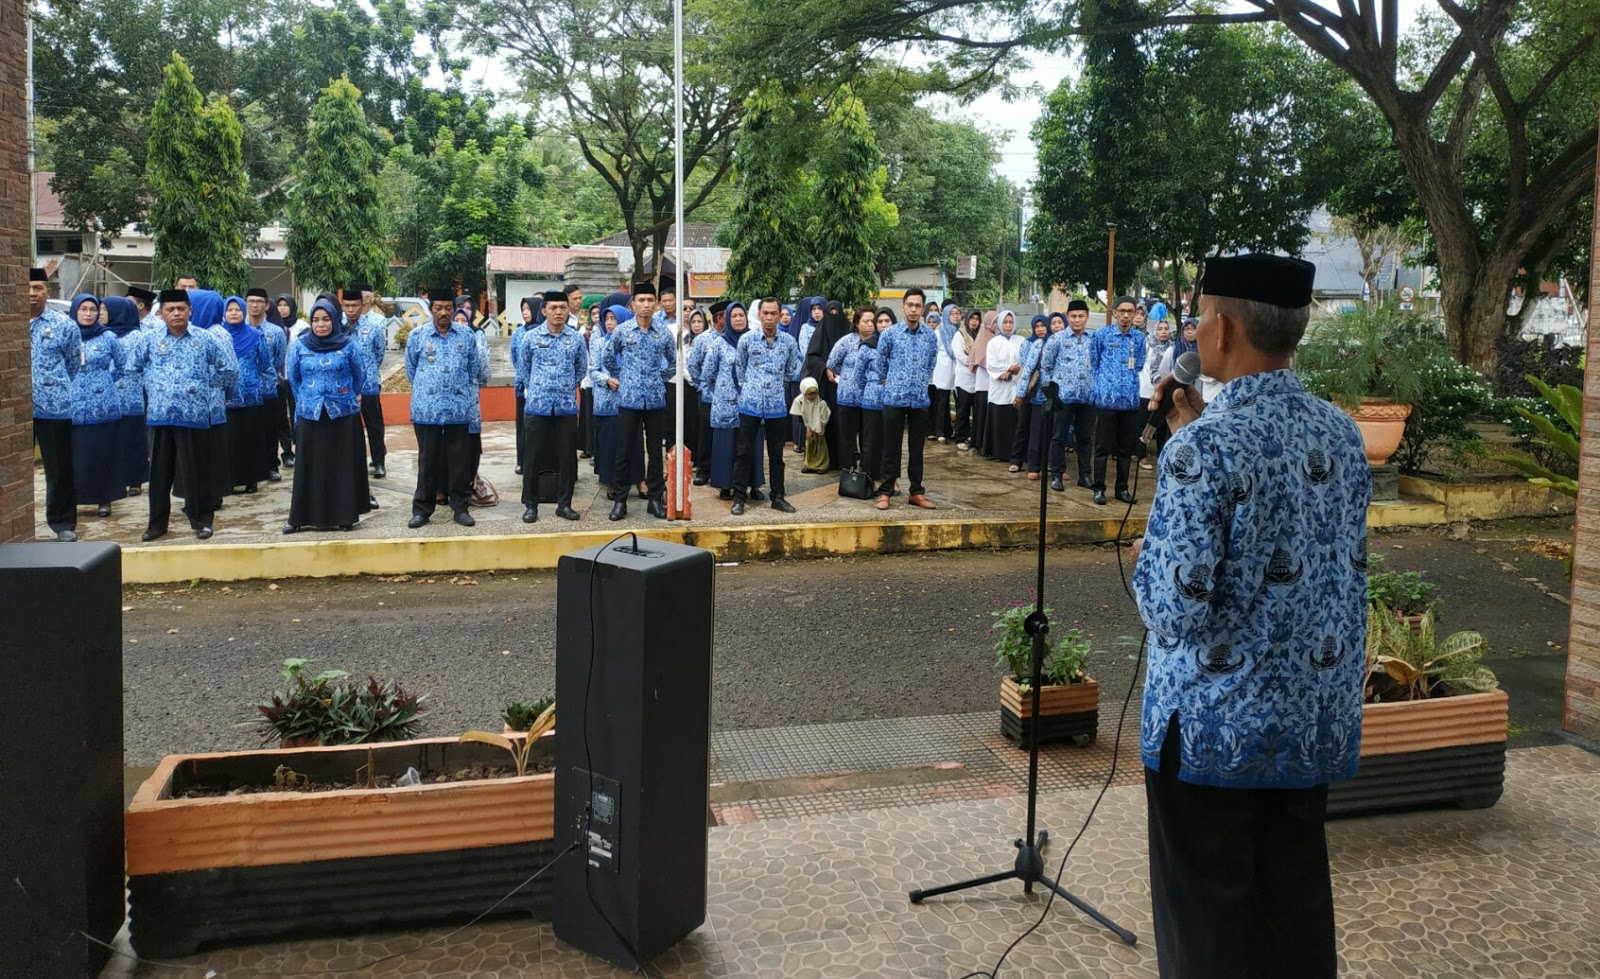 Peringati HKN, Pemerintahan Kecamatan Tanete Riattang Gelar Apel Gabungan